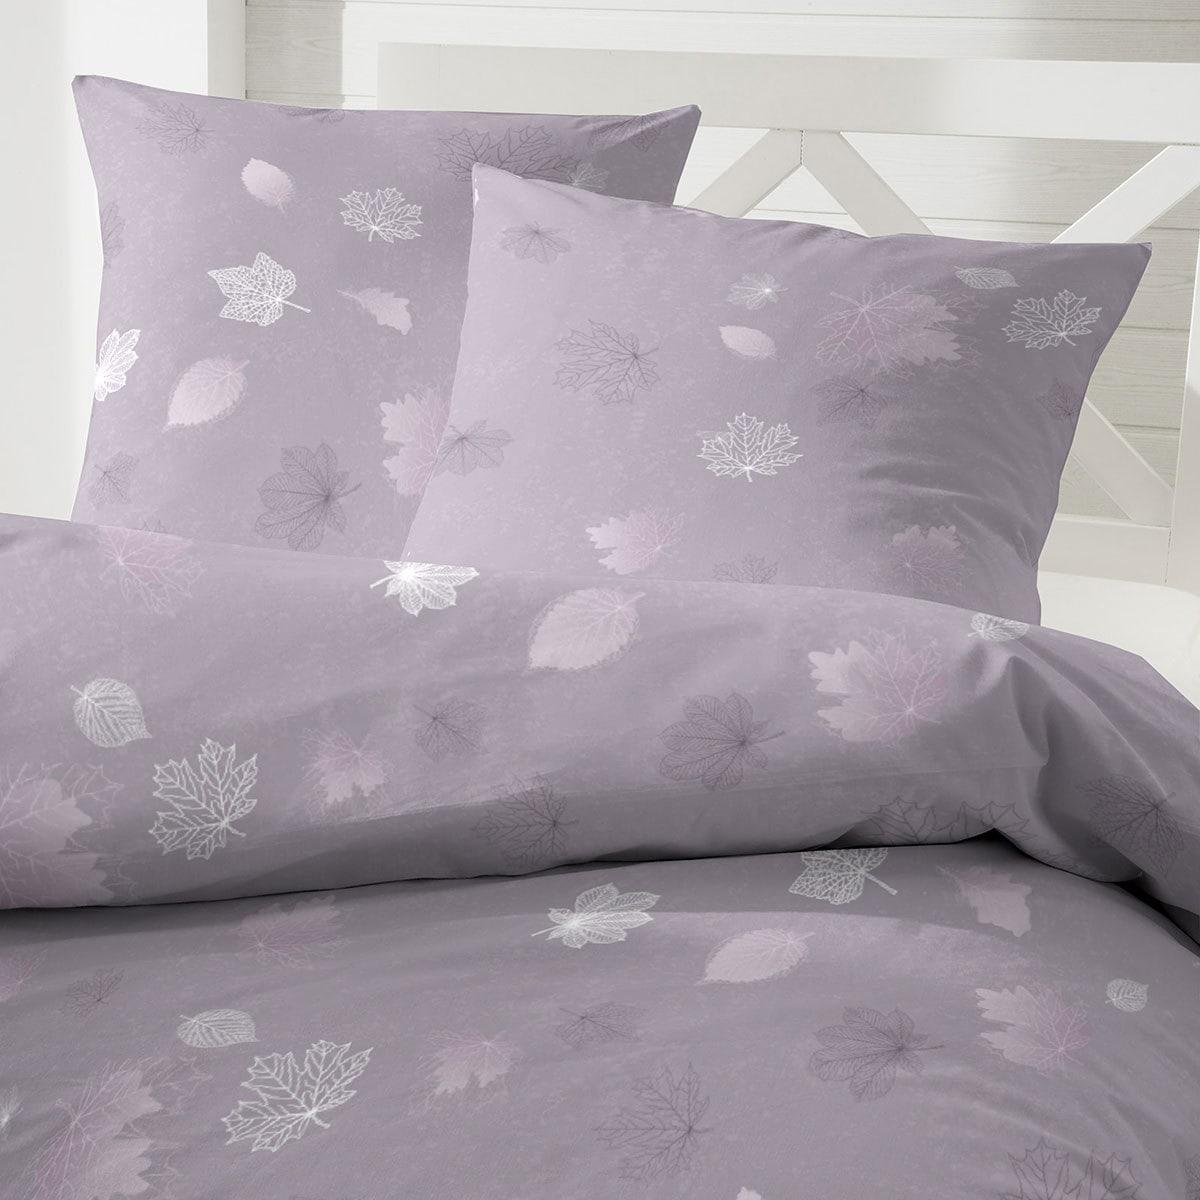 enrico coss soft jersey bettw sche paris mauve g nstig online kaufen bei bettwaren shop. Black Bedroom Furniture Sets. Home Design Ideas